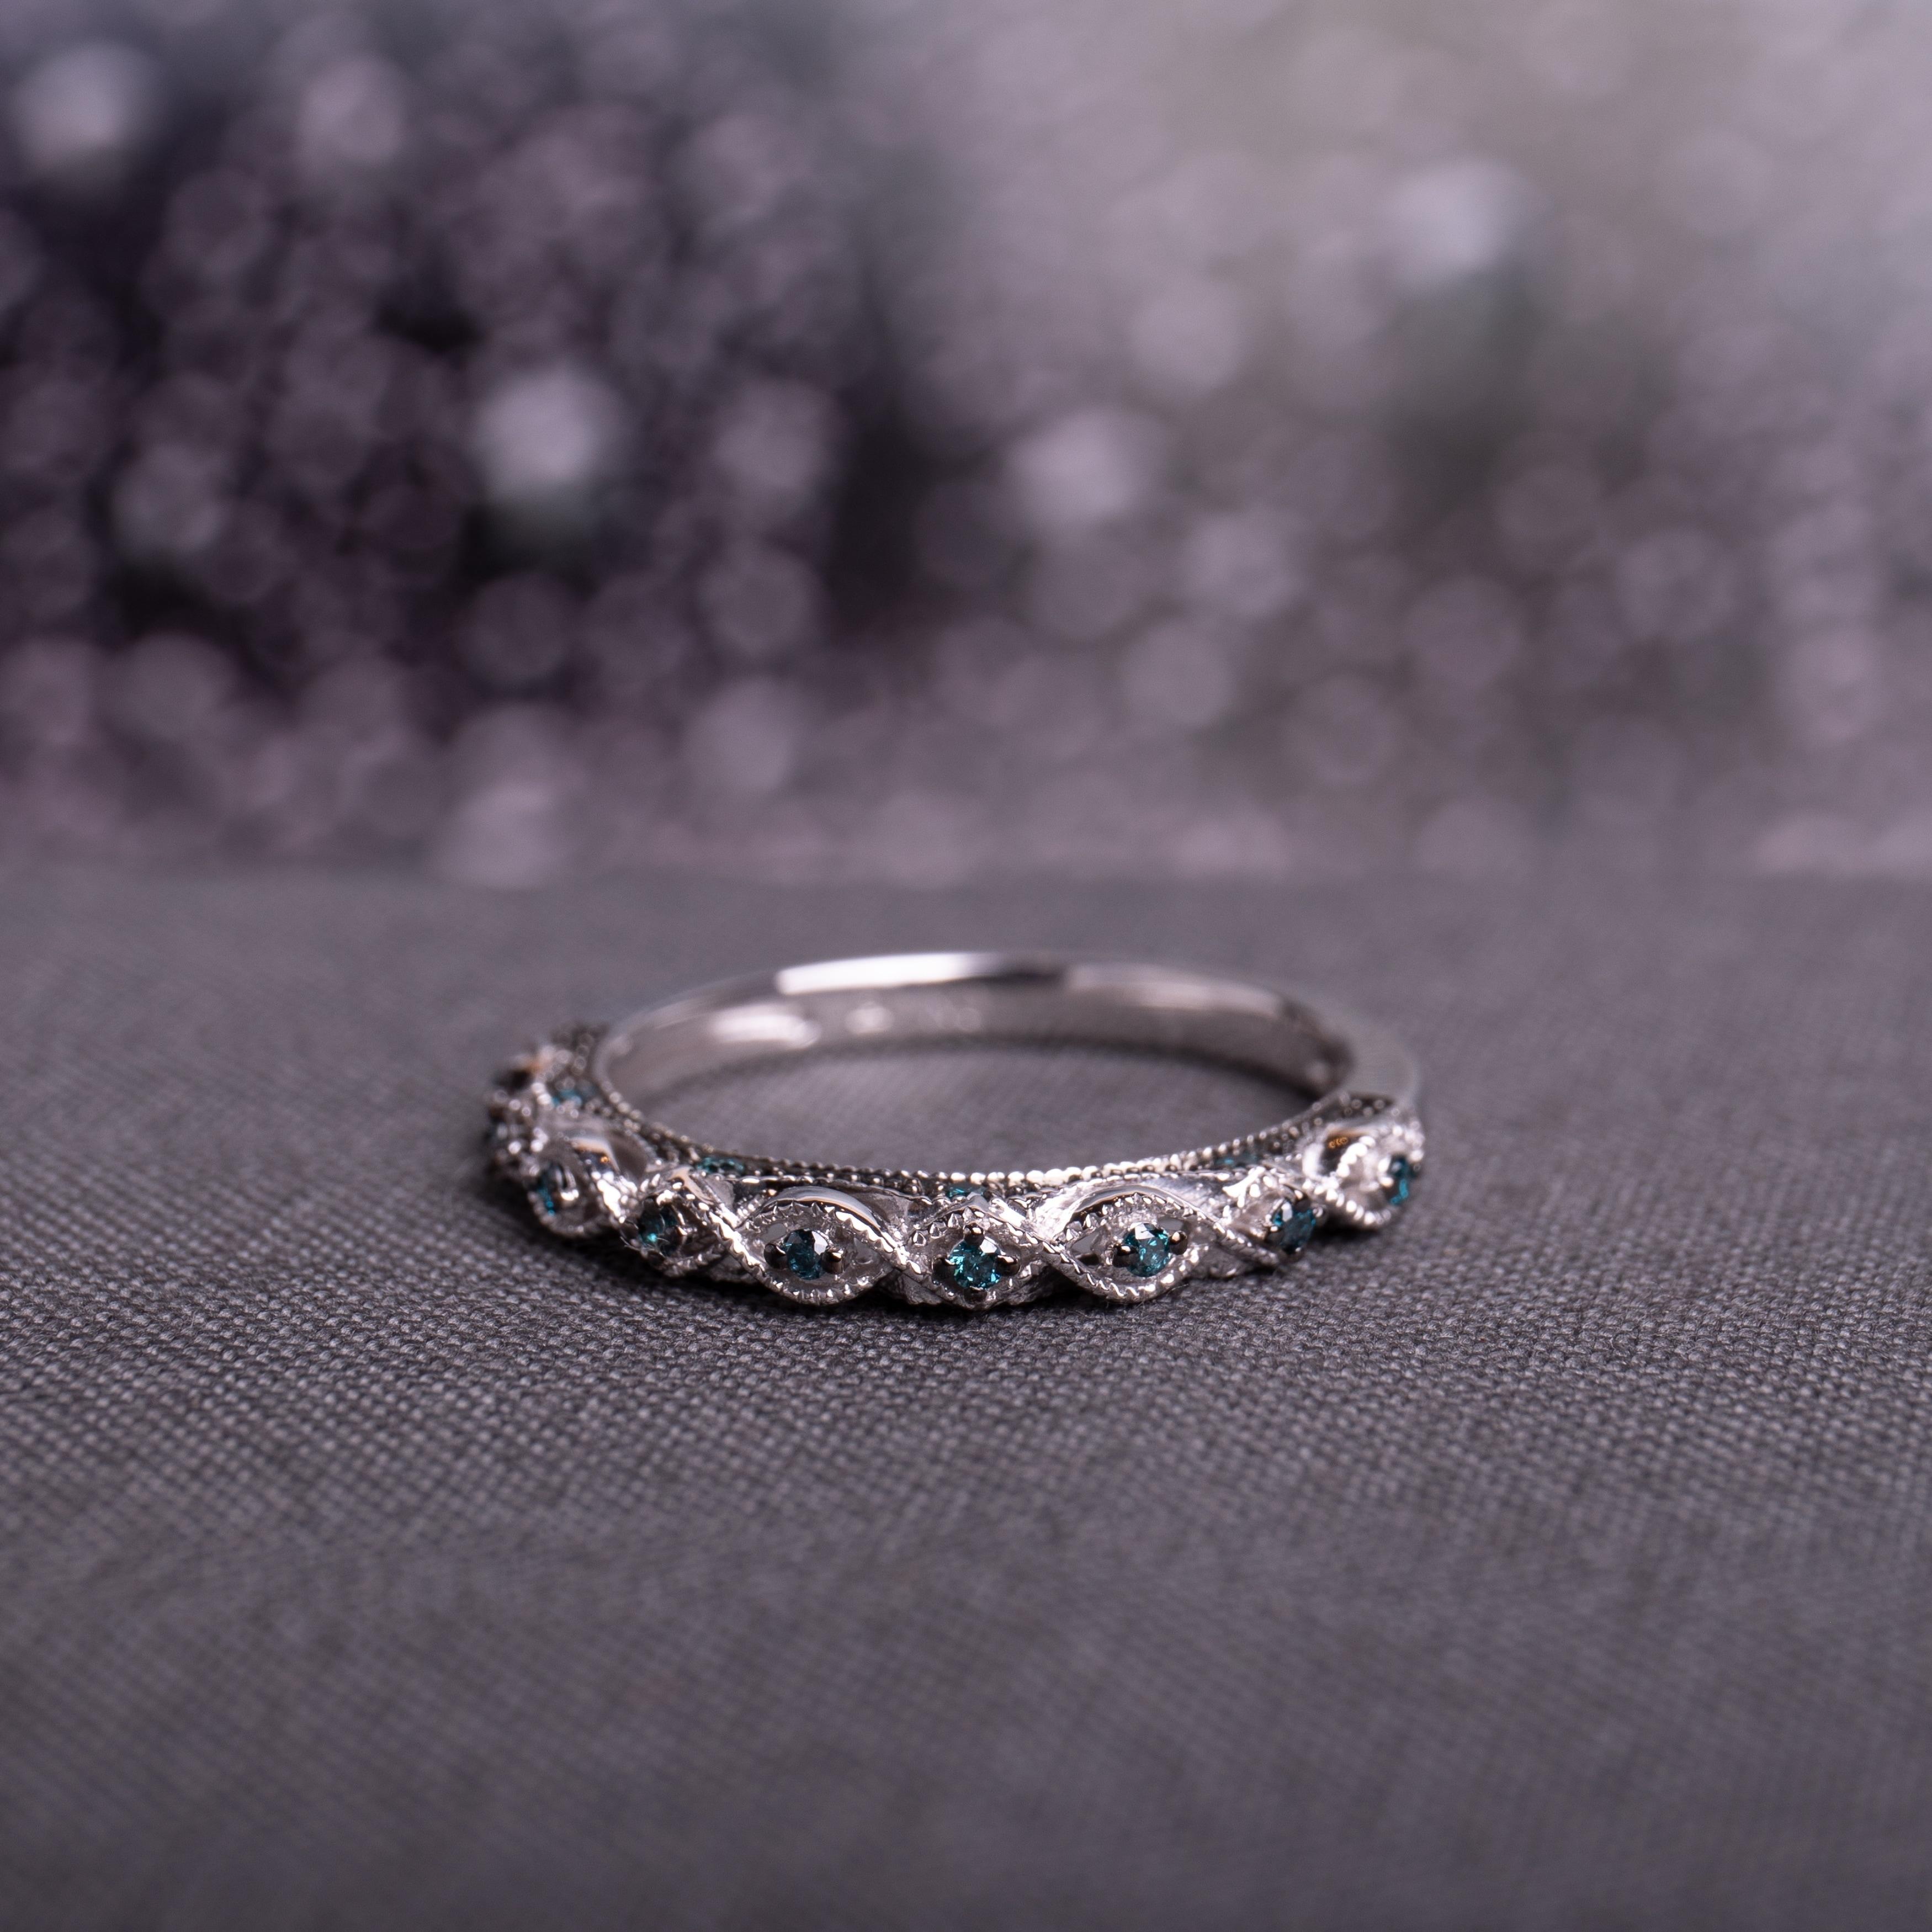 Vintage Diamond Wedding Ring 10K White Gold